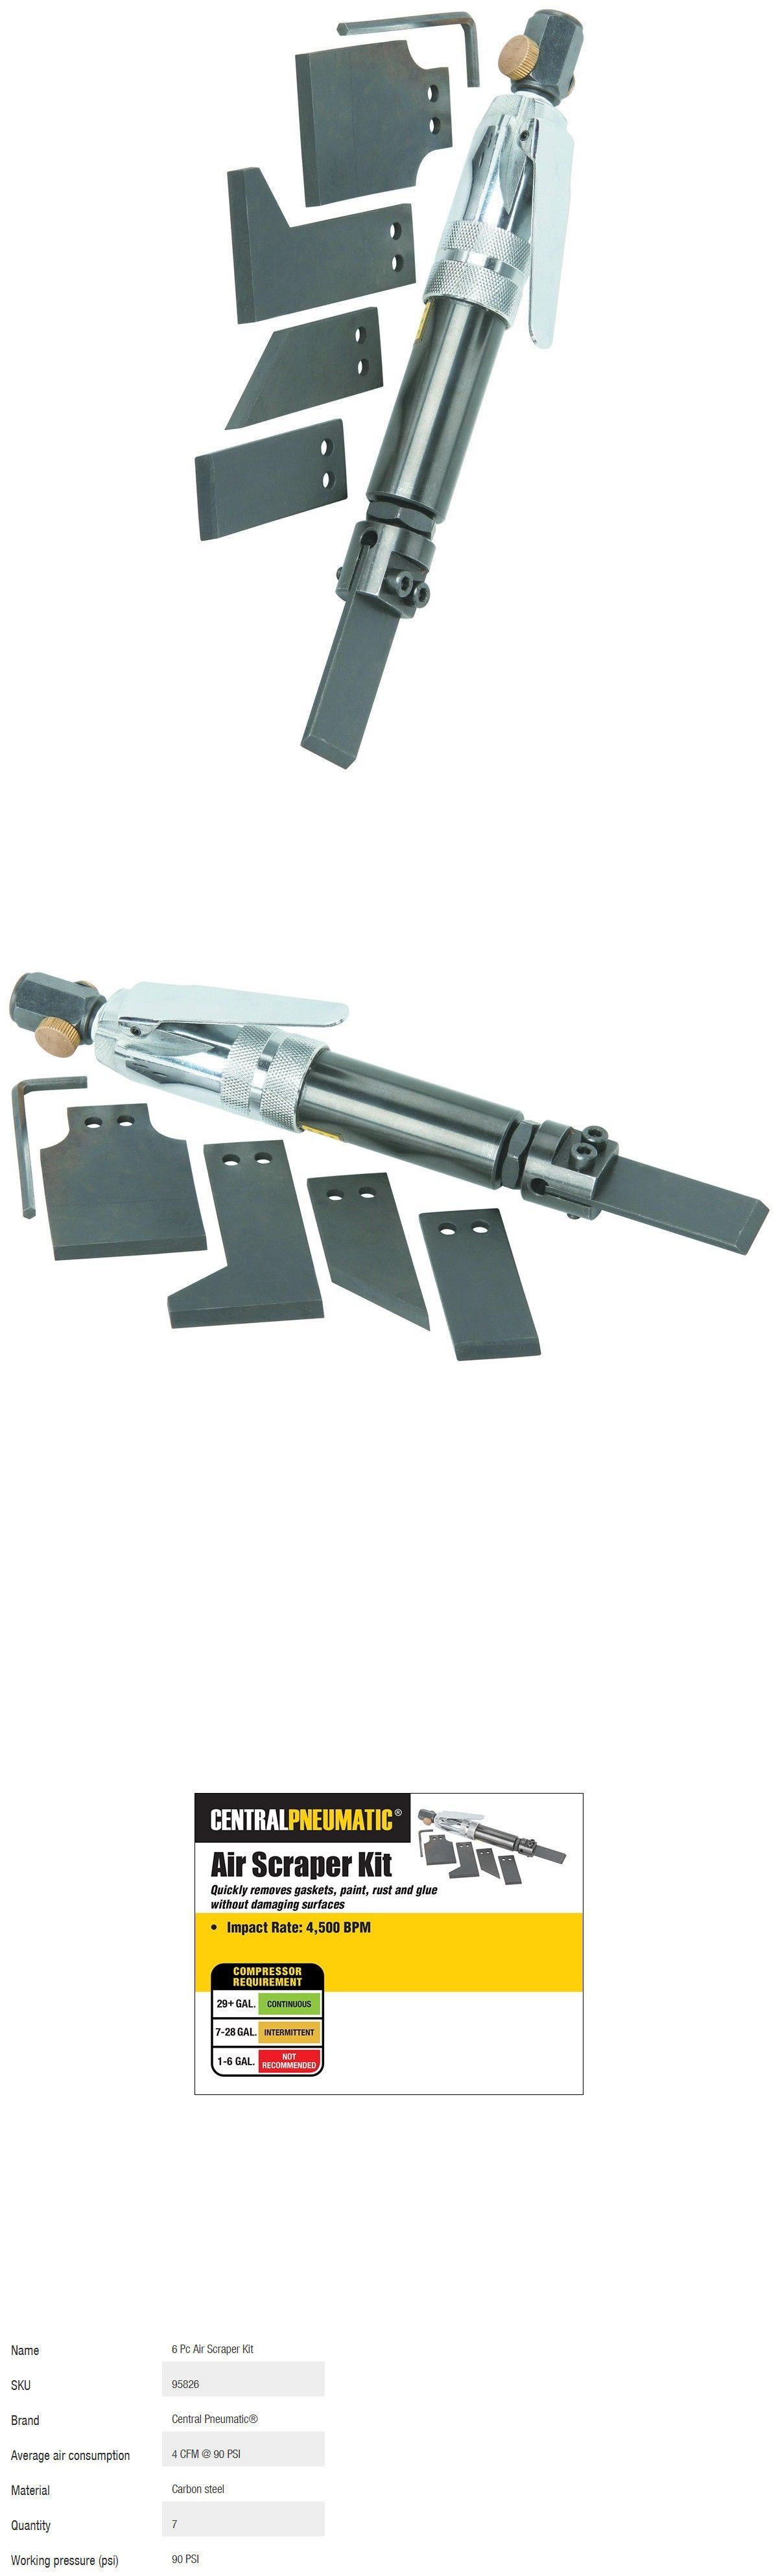 Remove Glue Paint Rust Gasket Air Scraper Set 6 Pc Pneumatic Kit Regulator